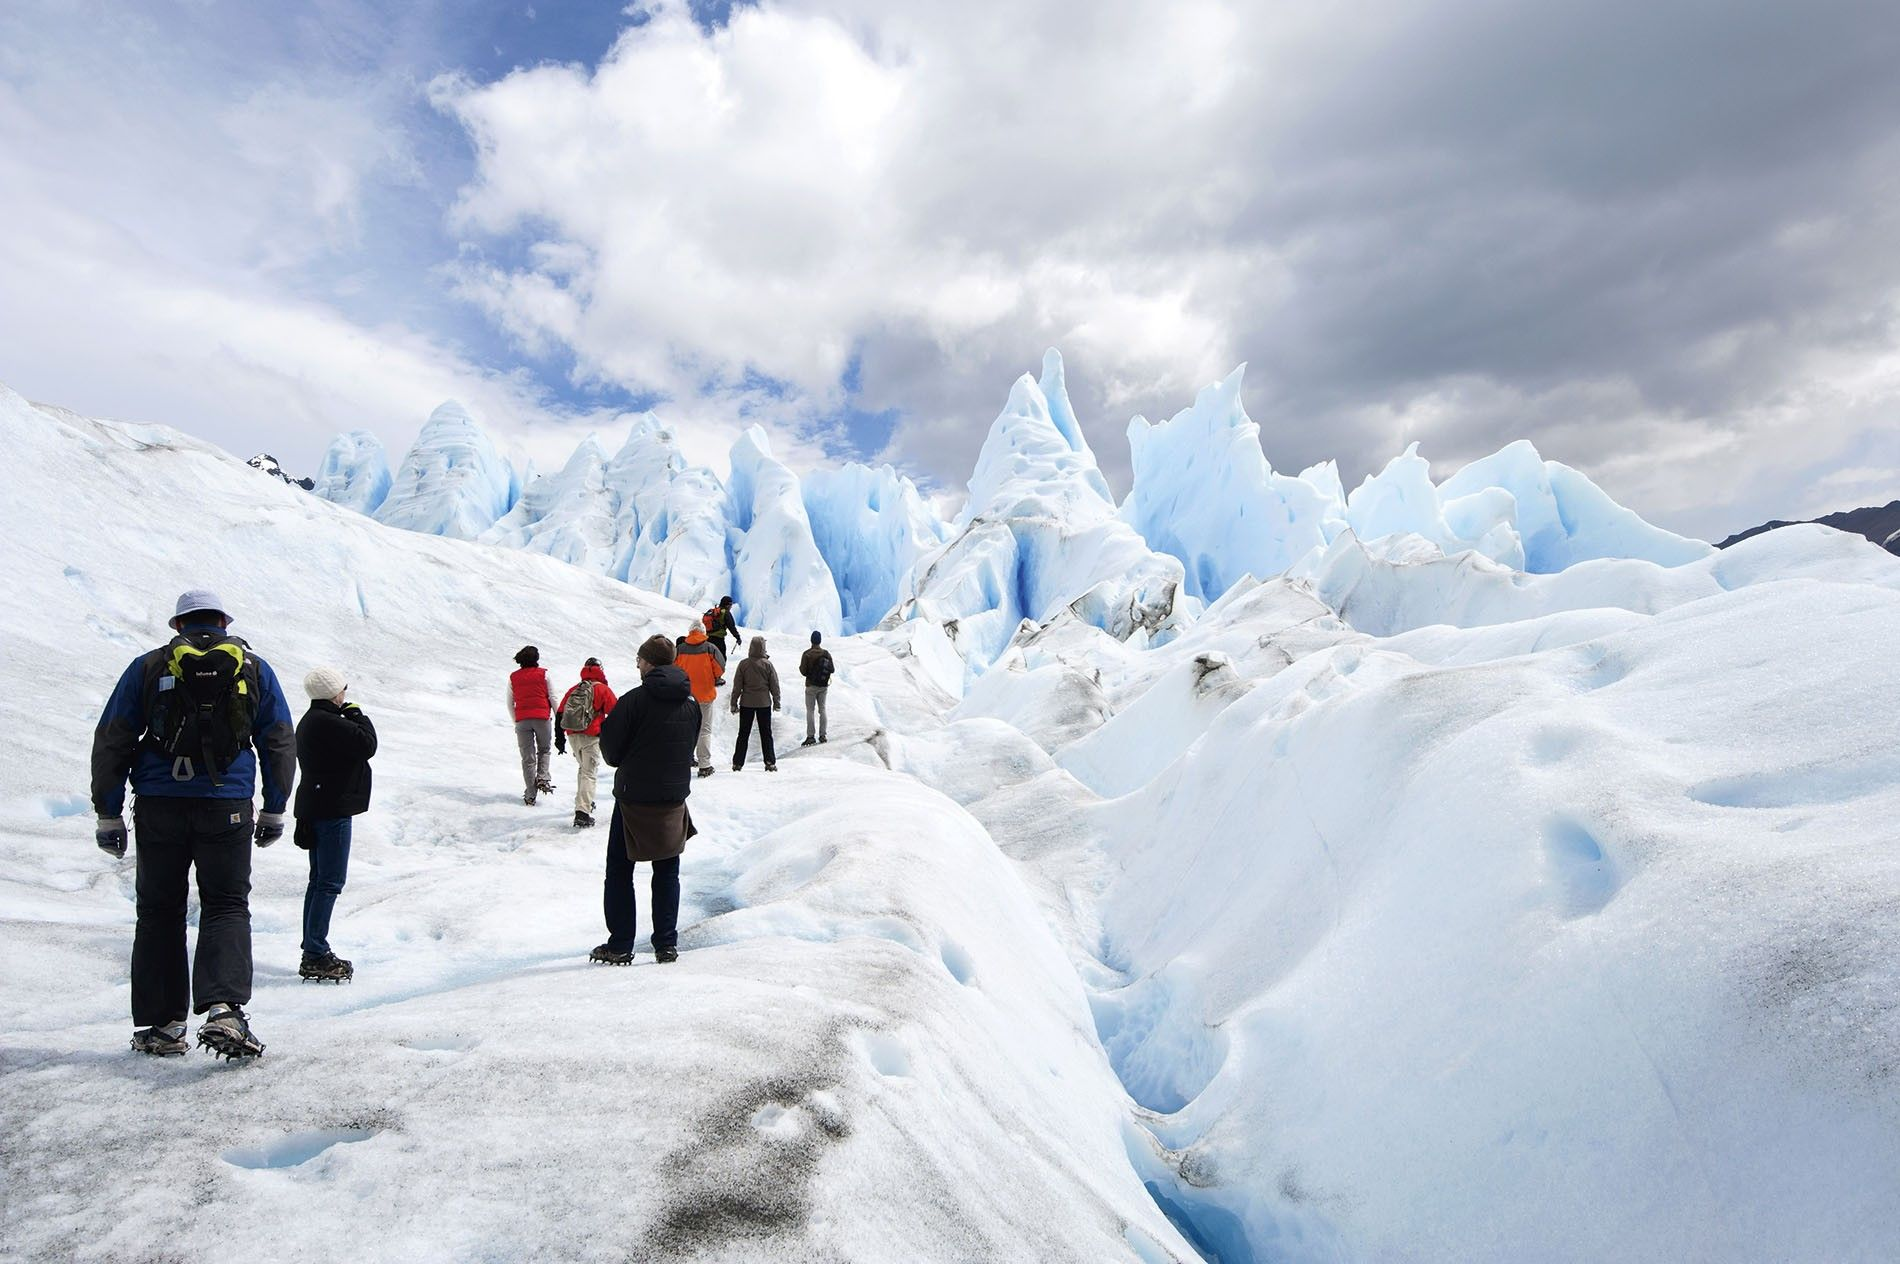 Ice-trekking on the surface of Perito Moreno Glacier, Patagonia.